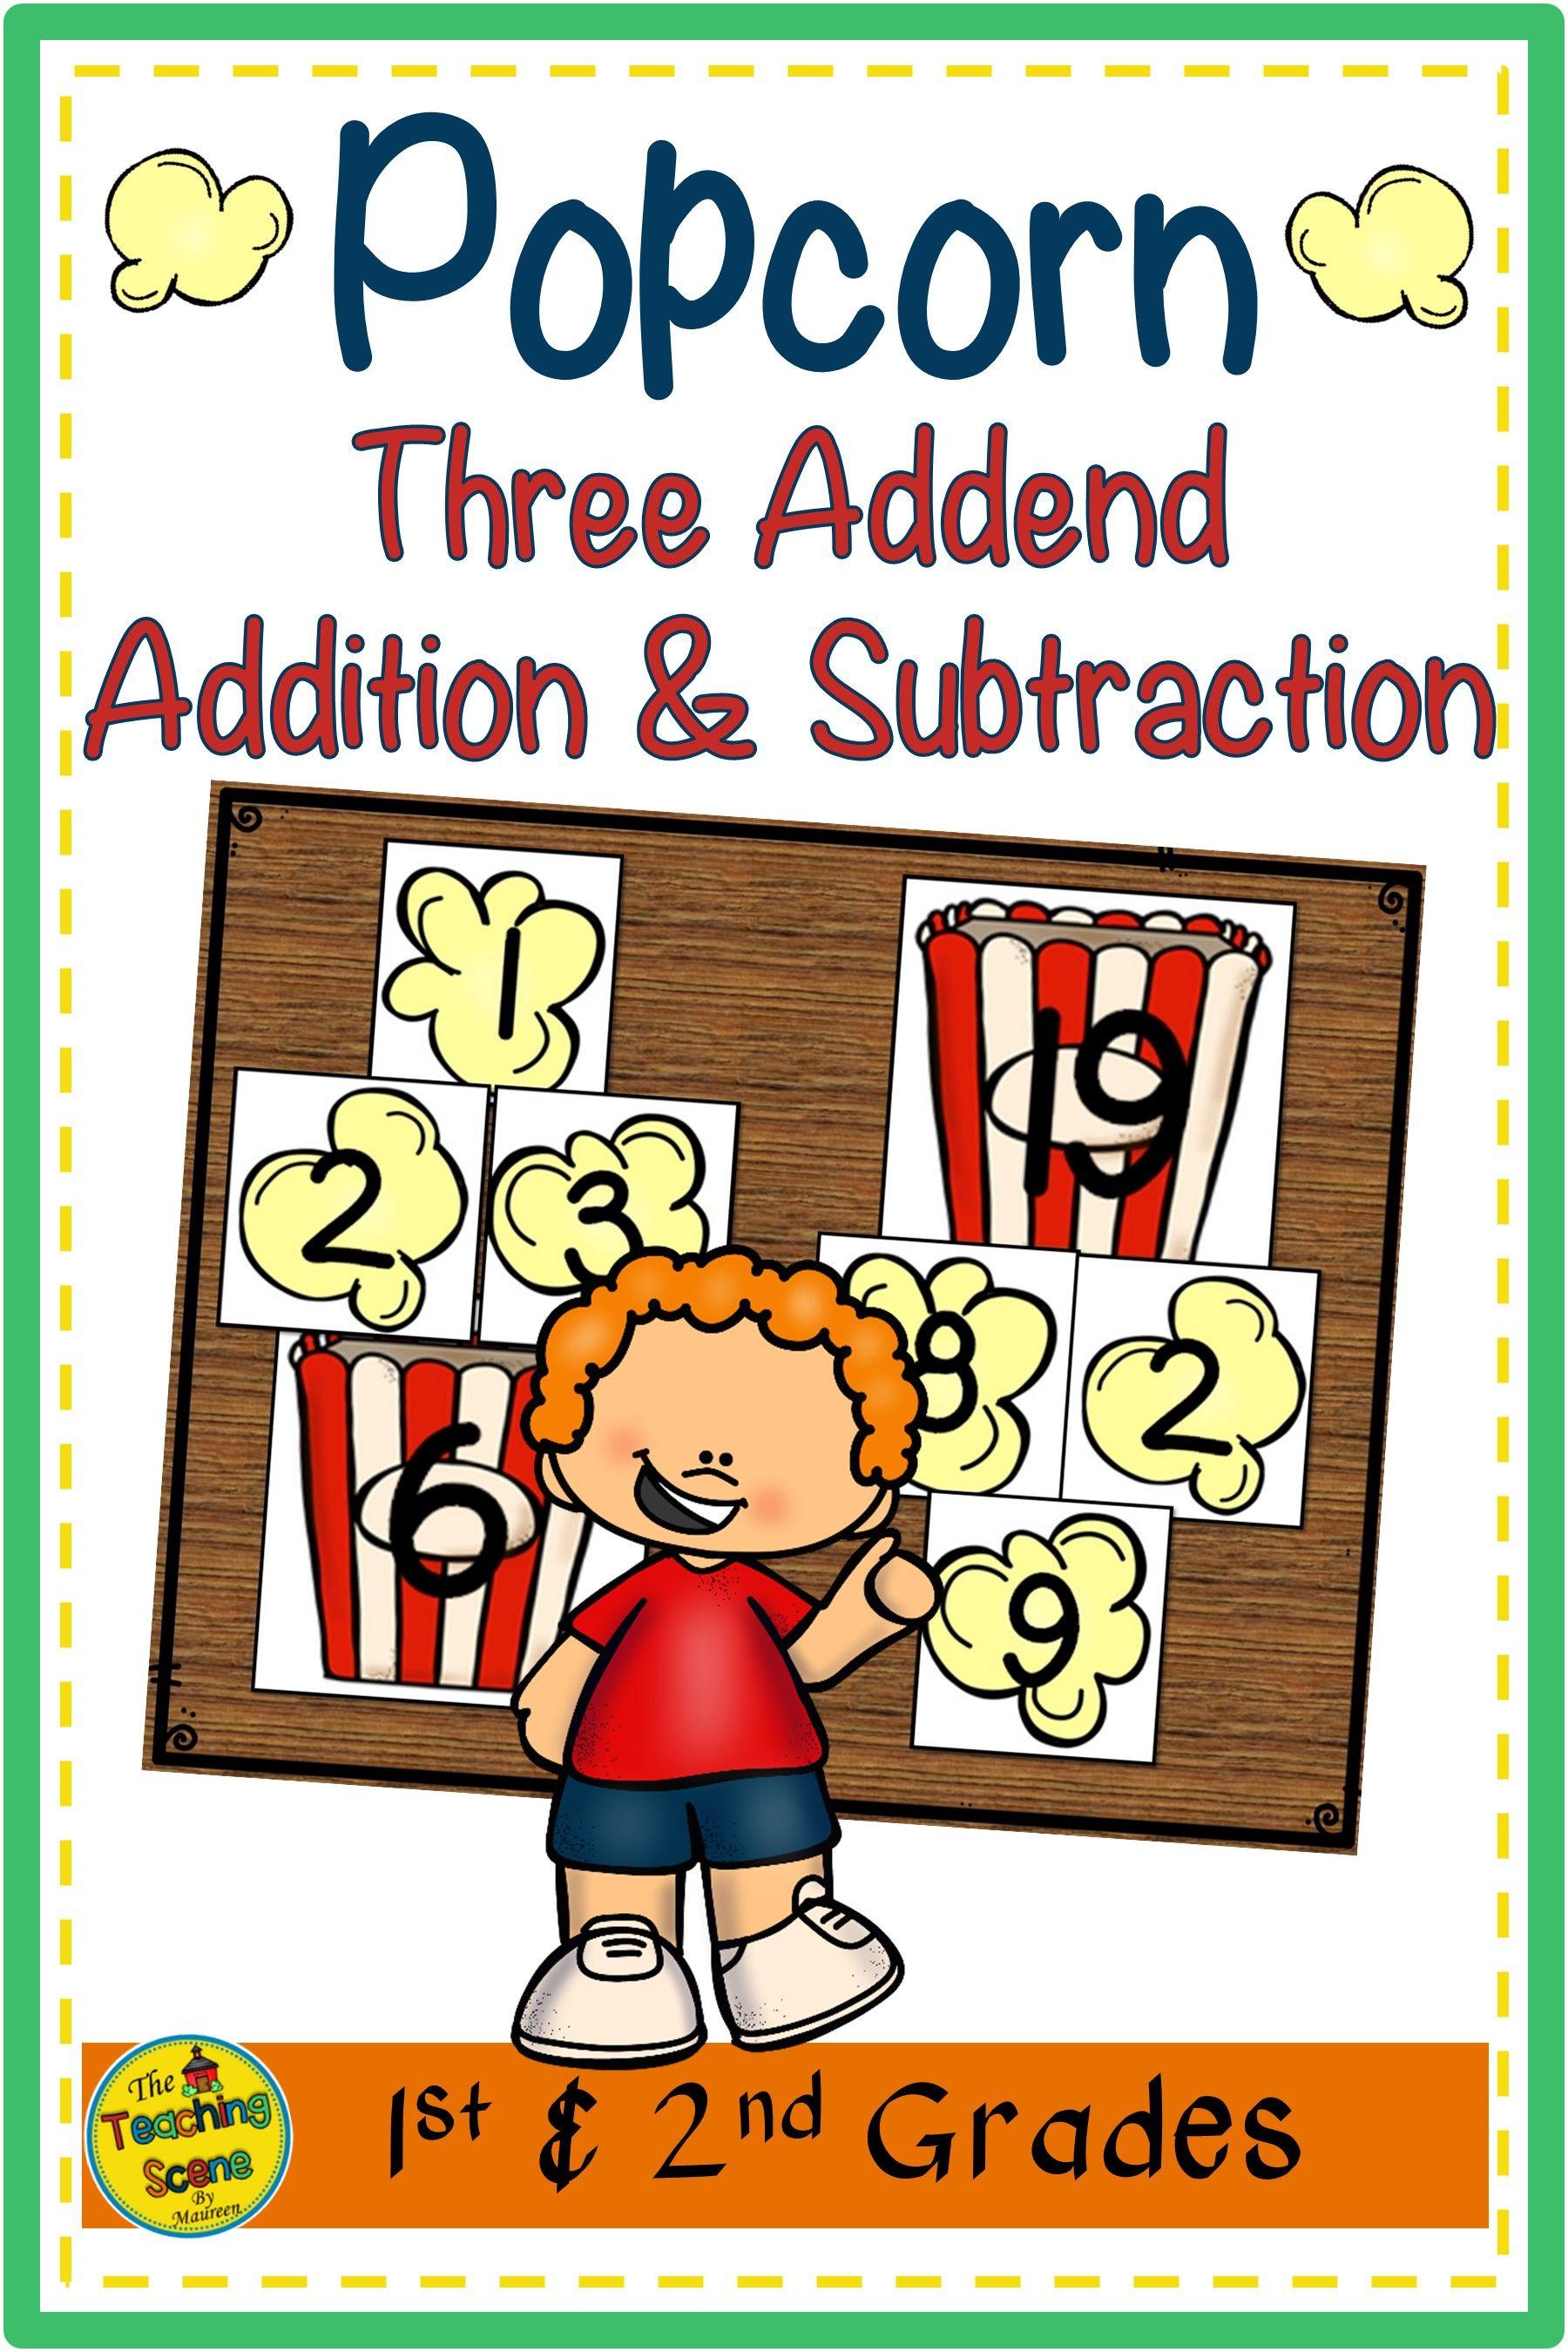 Popcorn Build 3 Addend Addition Amp Subtraction Sentences In